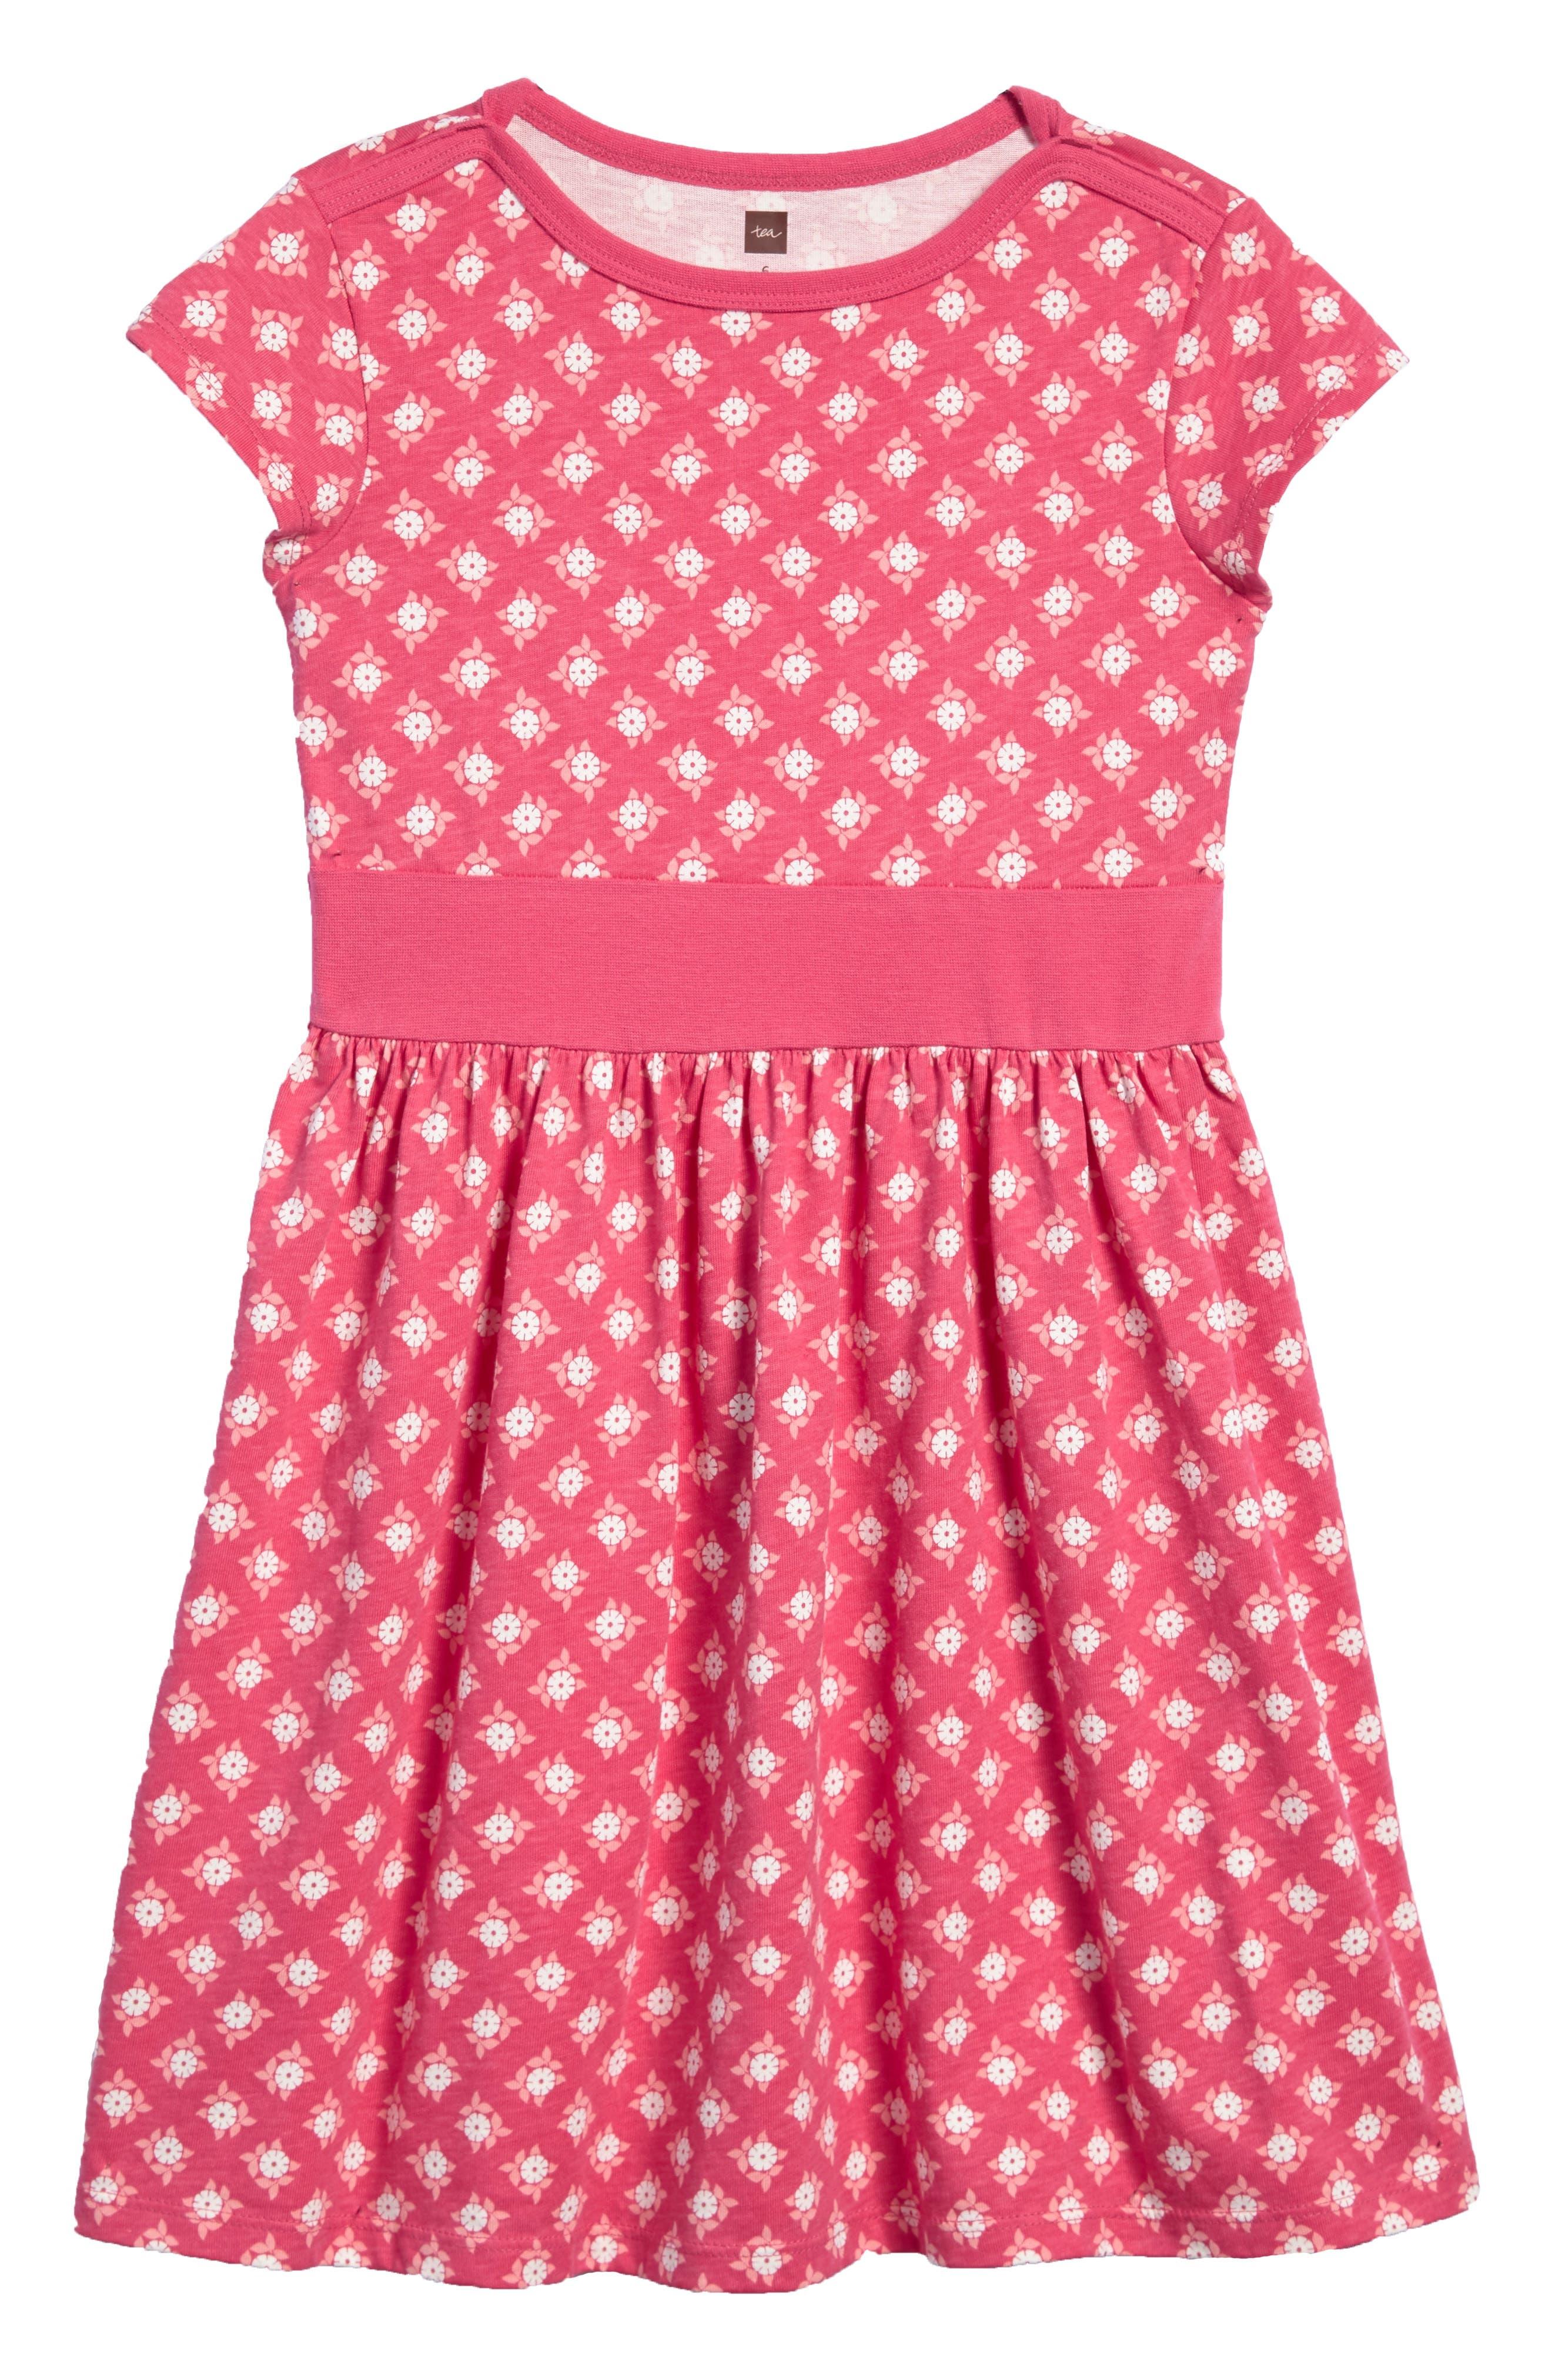 Sunburst Dress,                         Main,                         color, 650